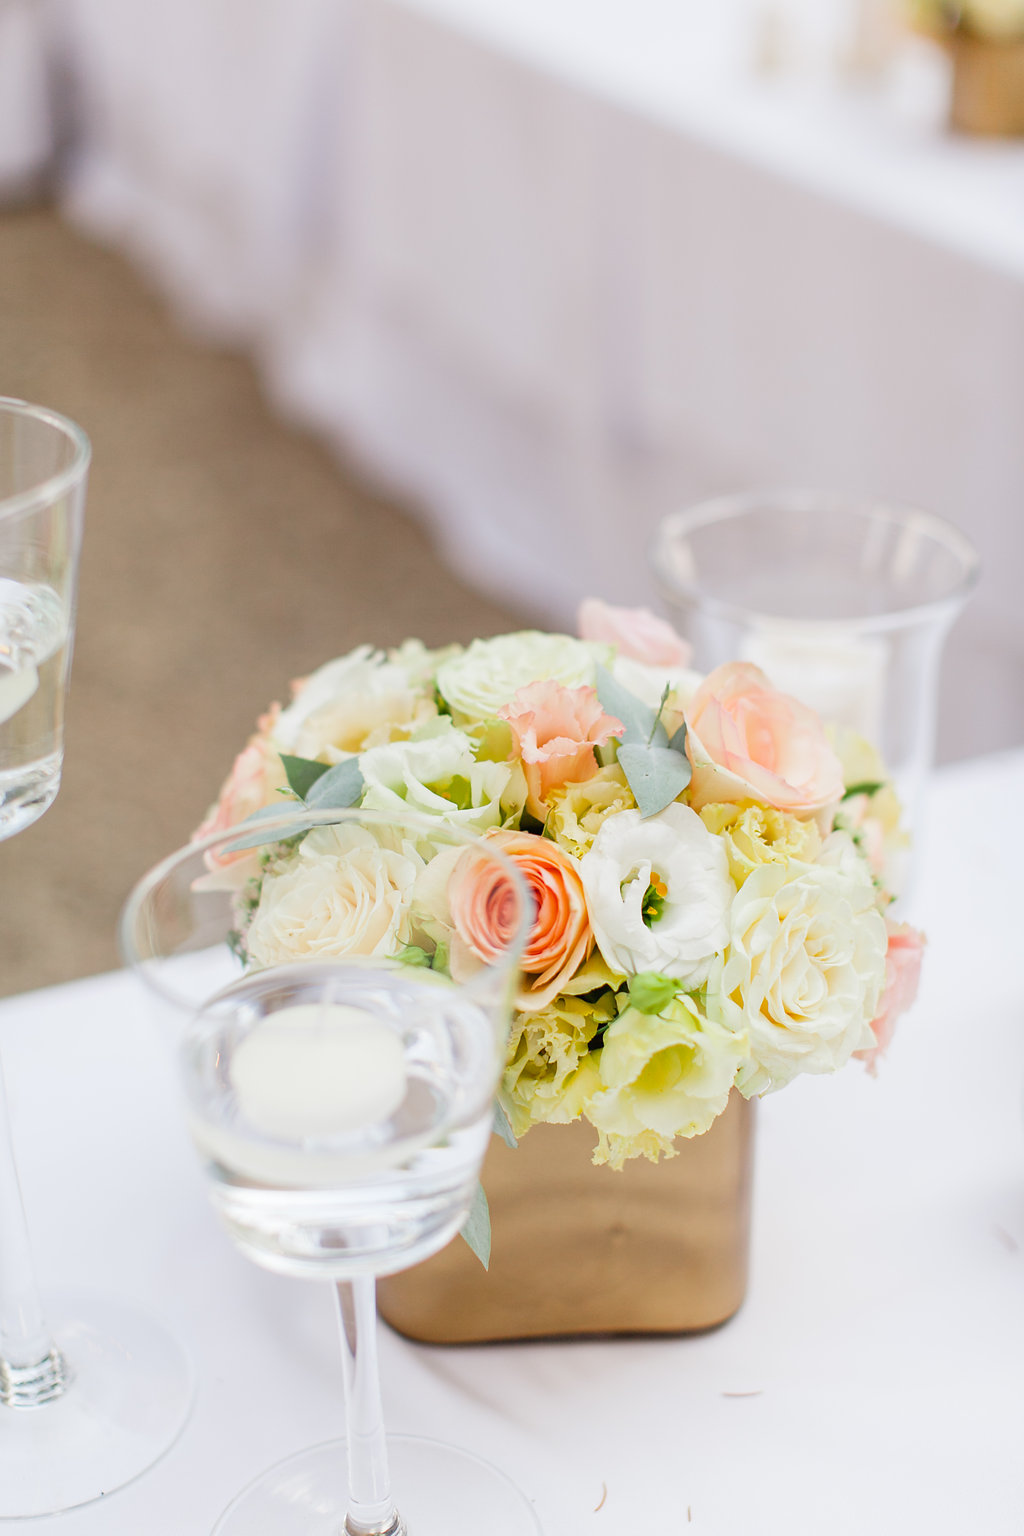 castelfalfi-tuscany-wedding-photographer-roberta-facchini-272